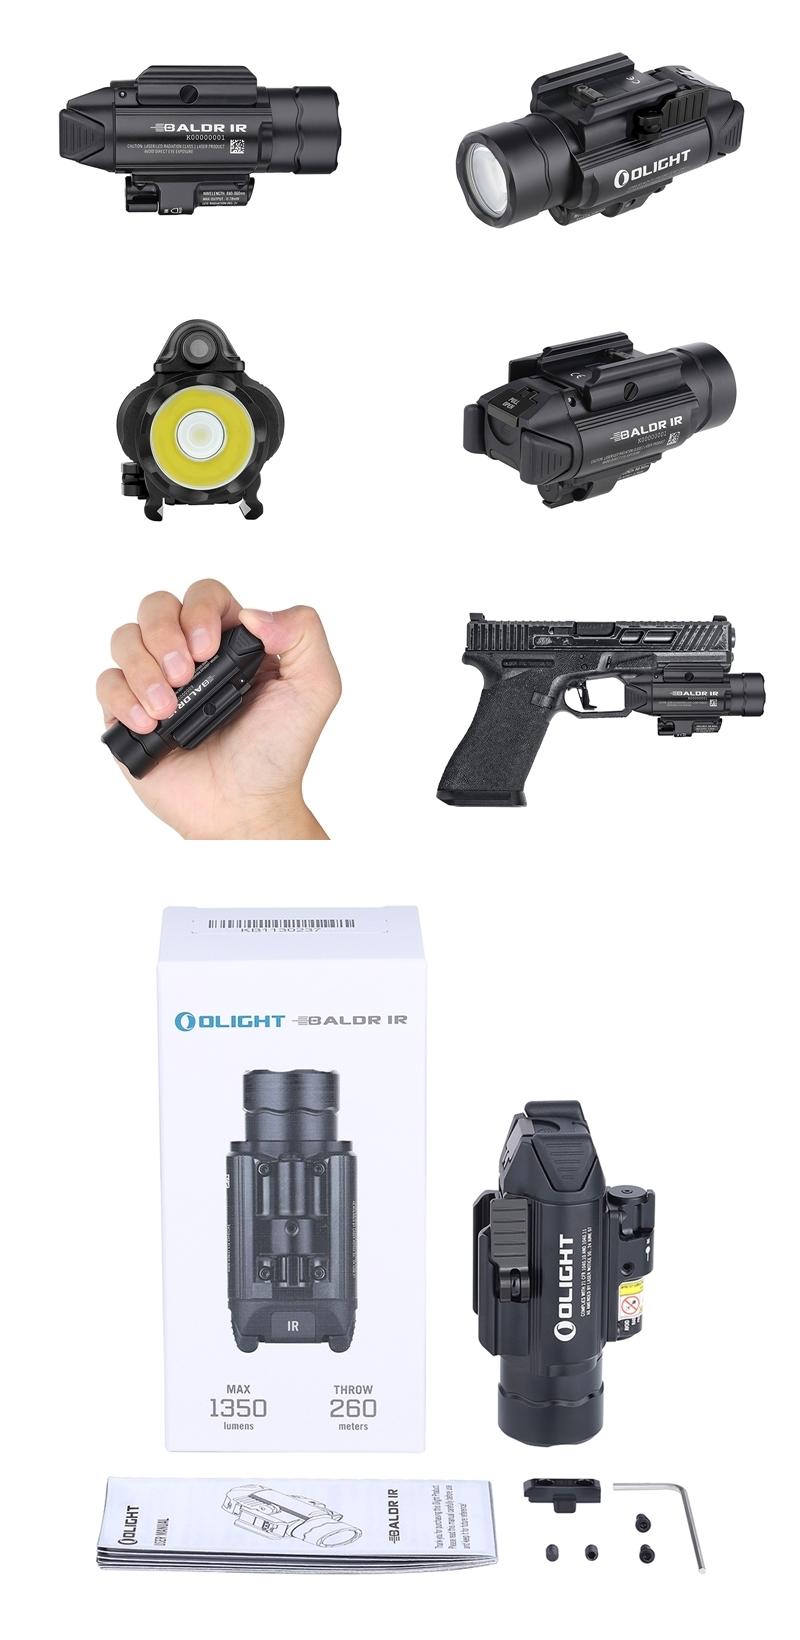 Baldr IR 1350流明 紅外線 瞄準器 白光LED 戰術 槍燈 850nm 0.78mW 紅外線光束 錸特光電 OLIGHT 台灣總代理-16